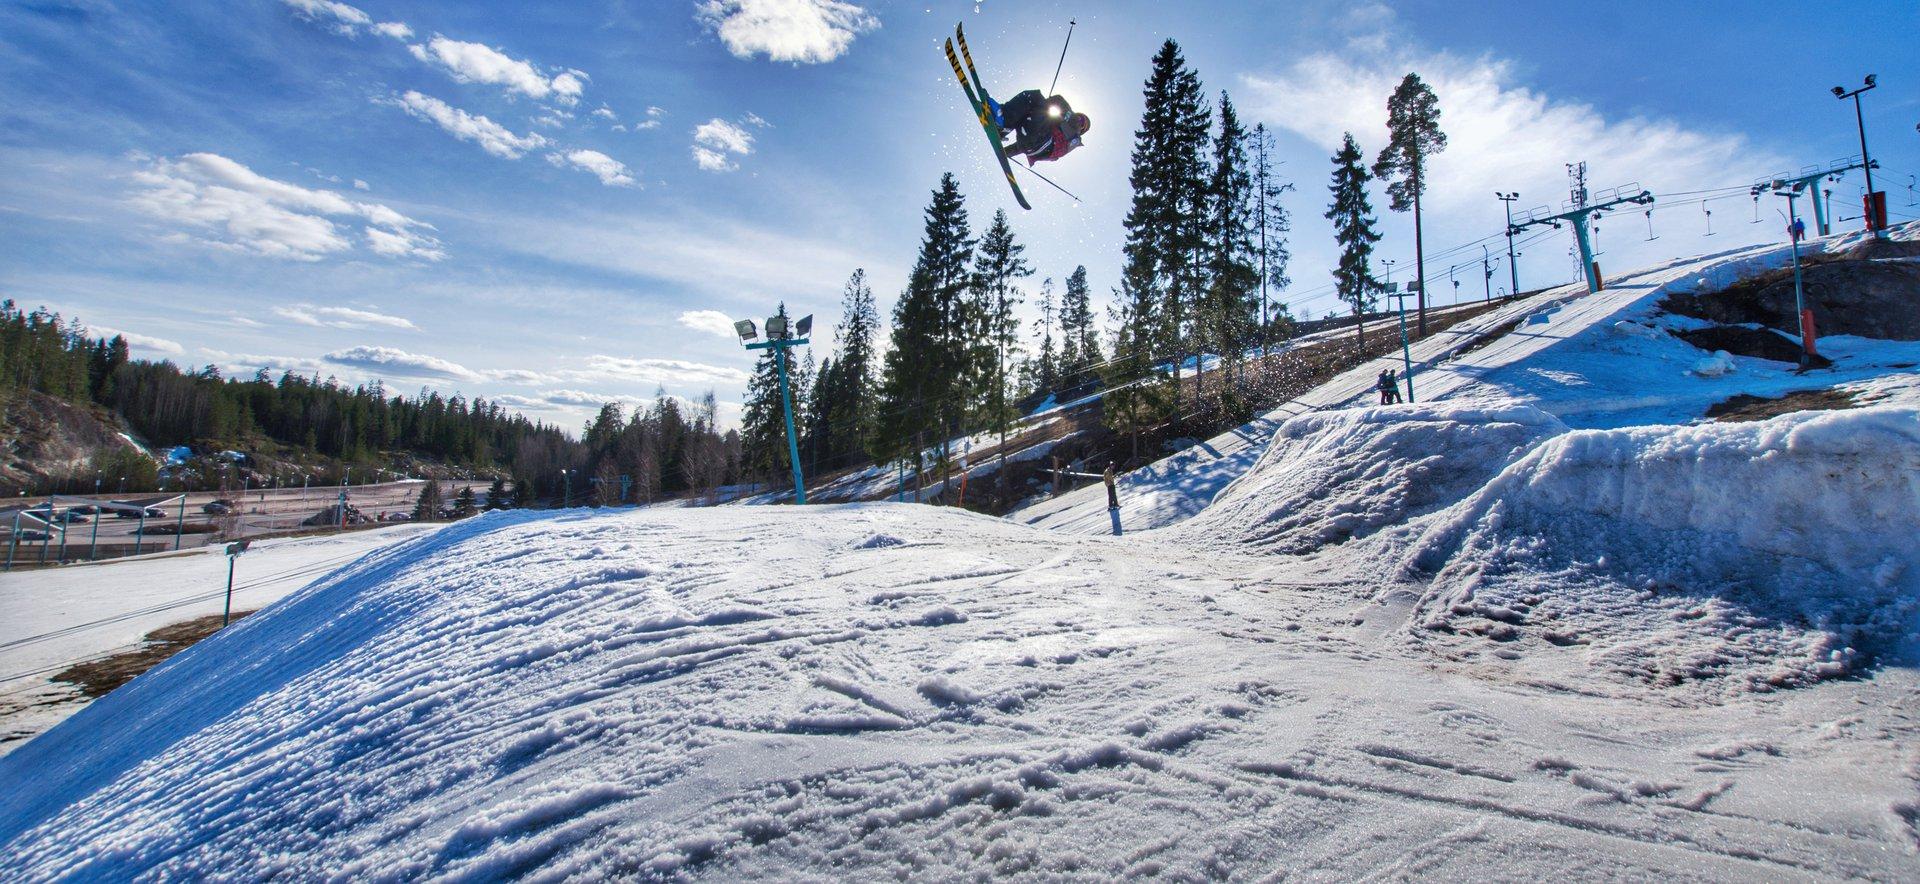 cork 7 at serena ski